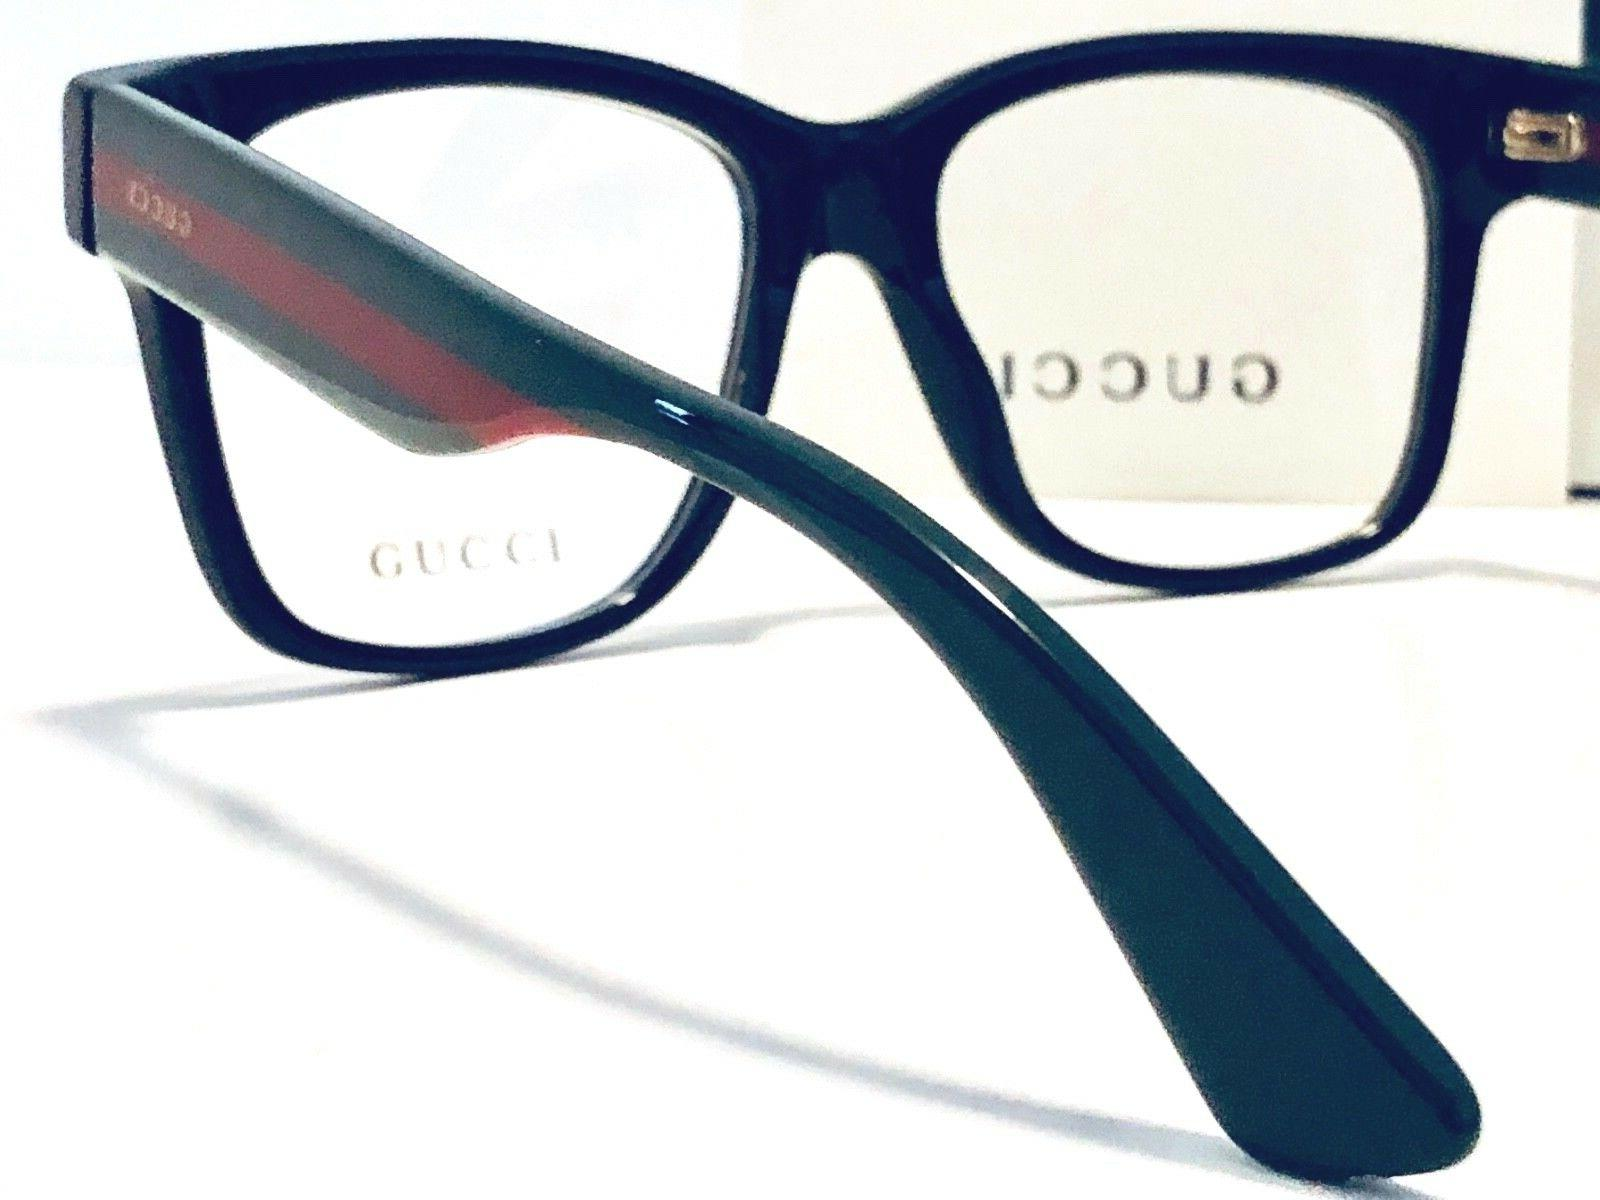 Gucci Eyeglasses Sensual GG 004 w/ Temples 56